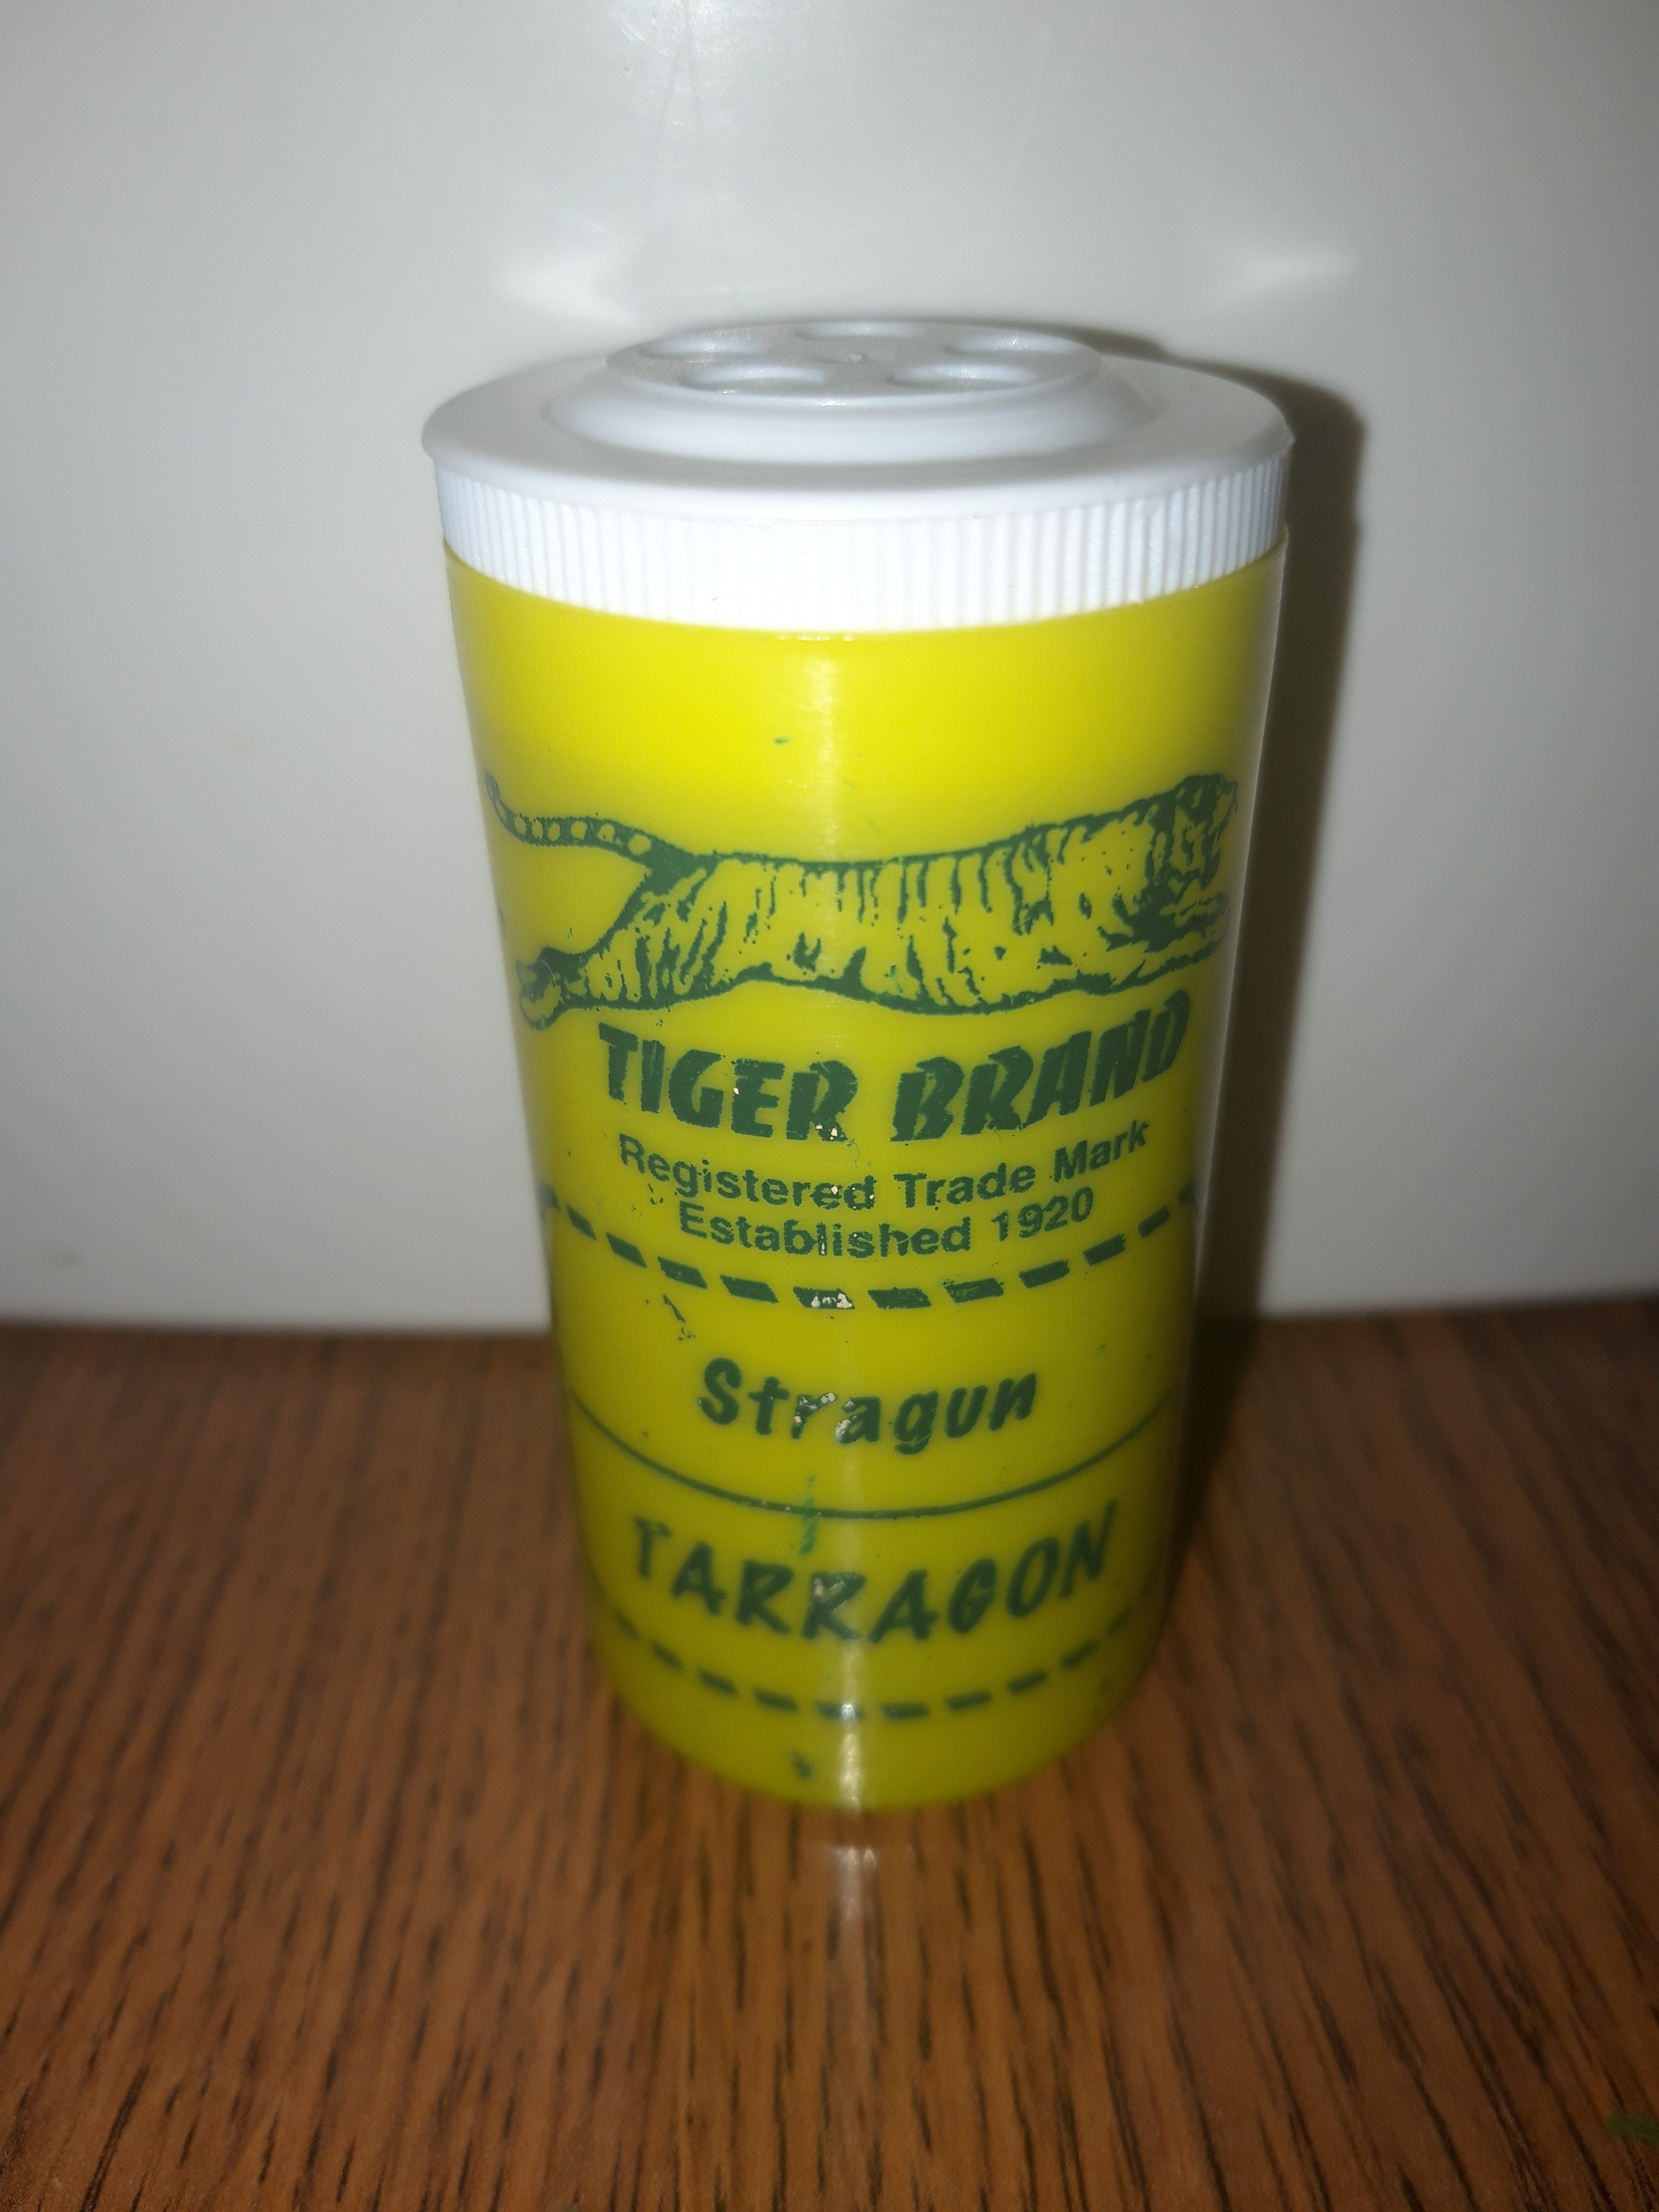 TIGER BRAND TARRAGON